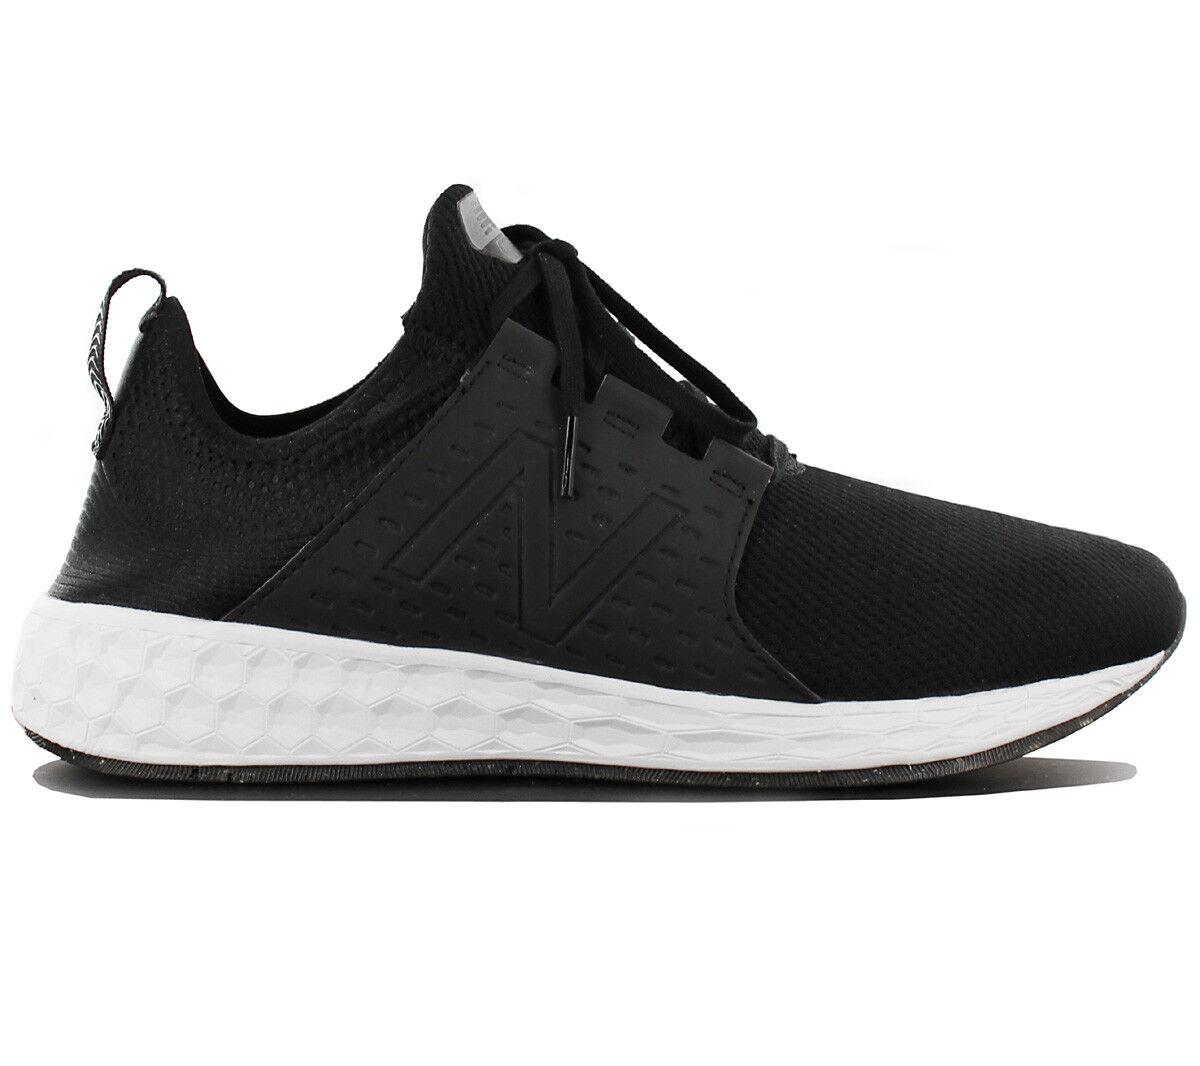 New balance Fresh foam cruz mcruzsb señores running fitness zapatos nuevo zapatillas